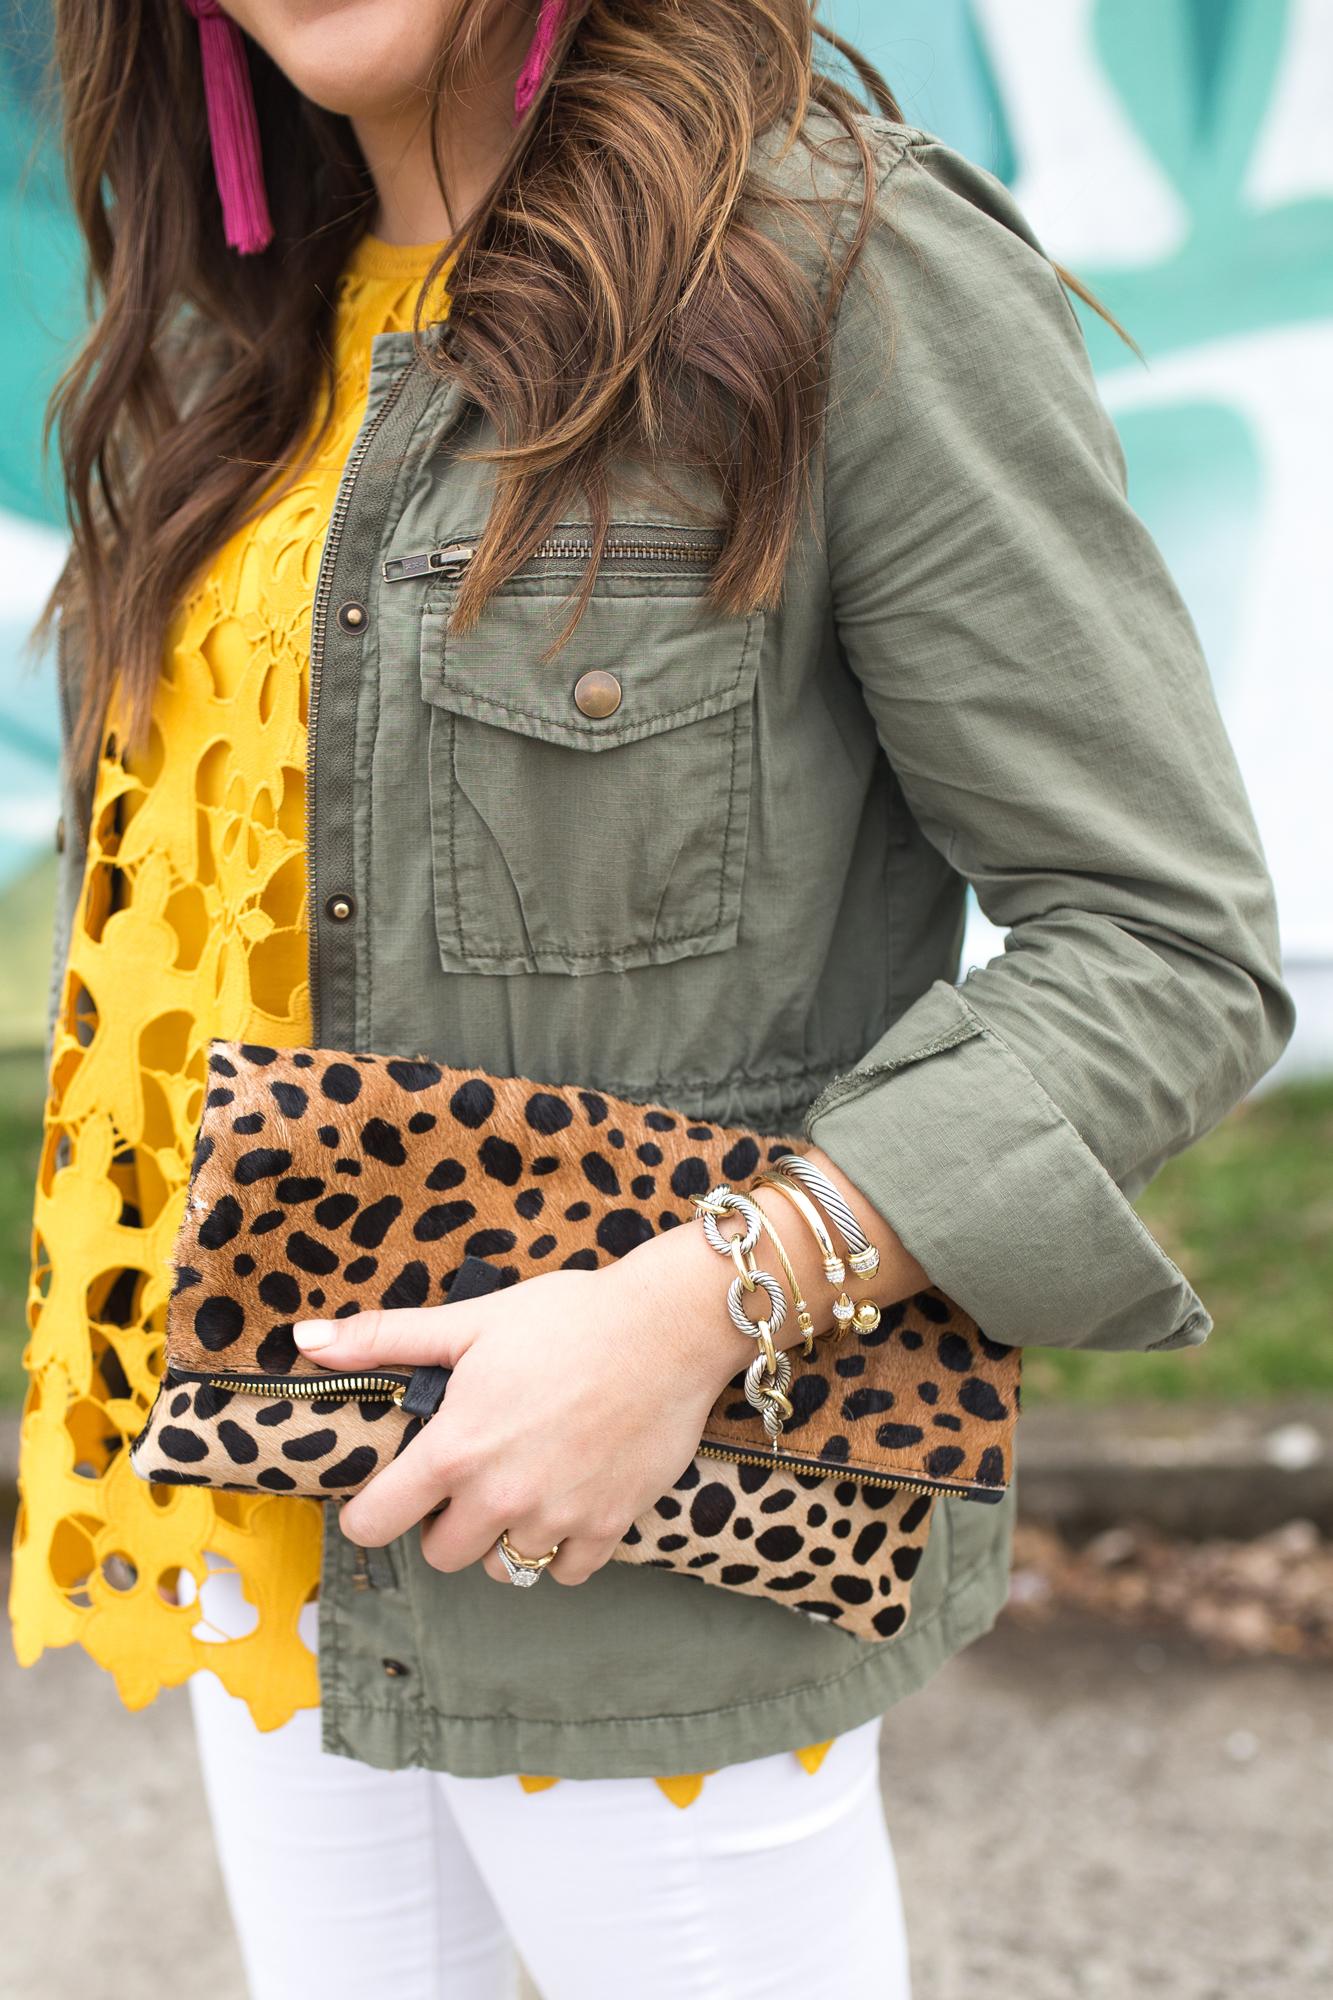 LOFT Lace Tank via Glitter & Gingham // White Jeans, Espadrille Wedges, Utility Jacket, Leopard Clutch, Tassel Earrings // Spring Style // How to wear white jeans